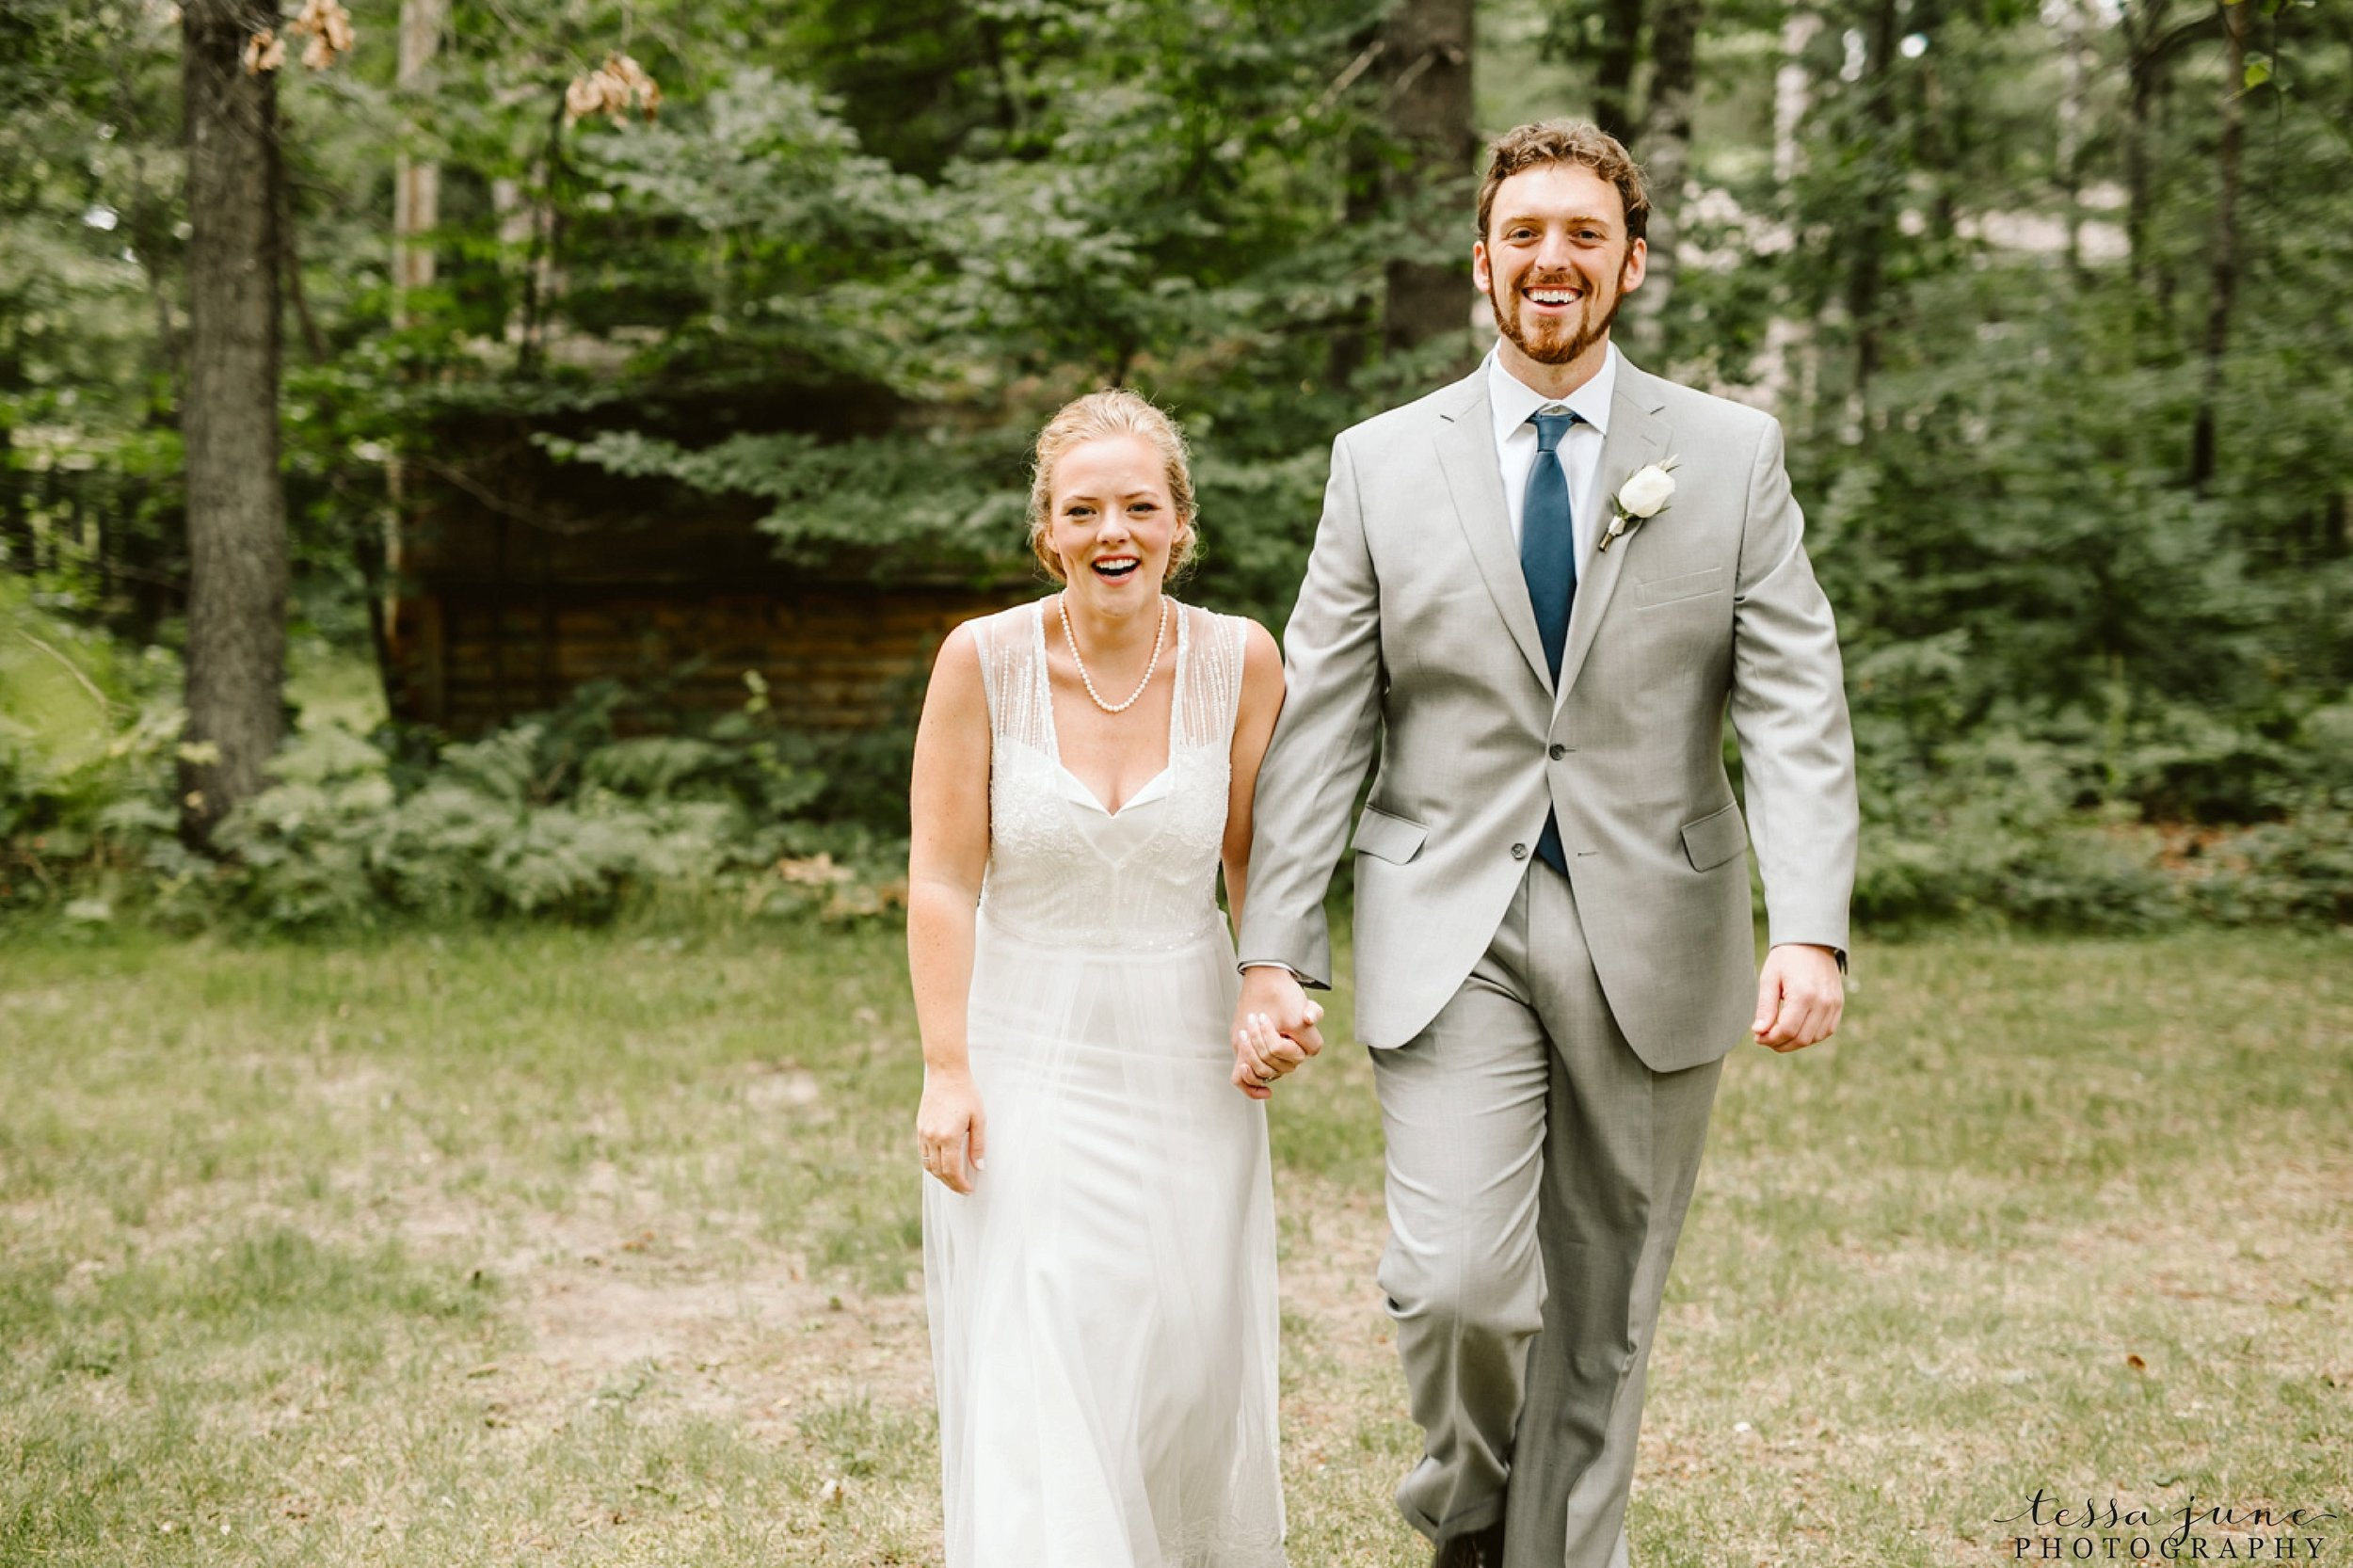 grandview-lodge-intimate-wedding-nisswa-minnesota_0021.jpg